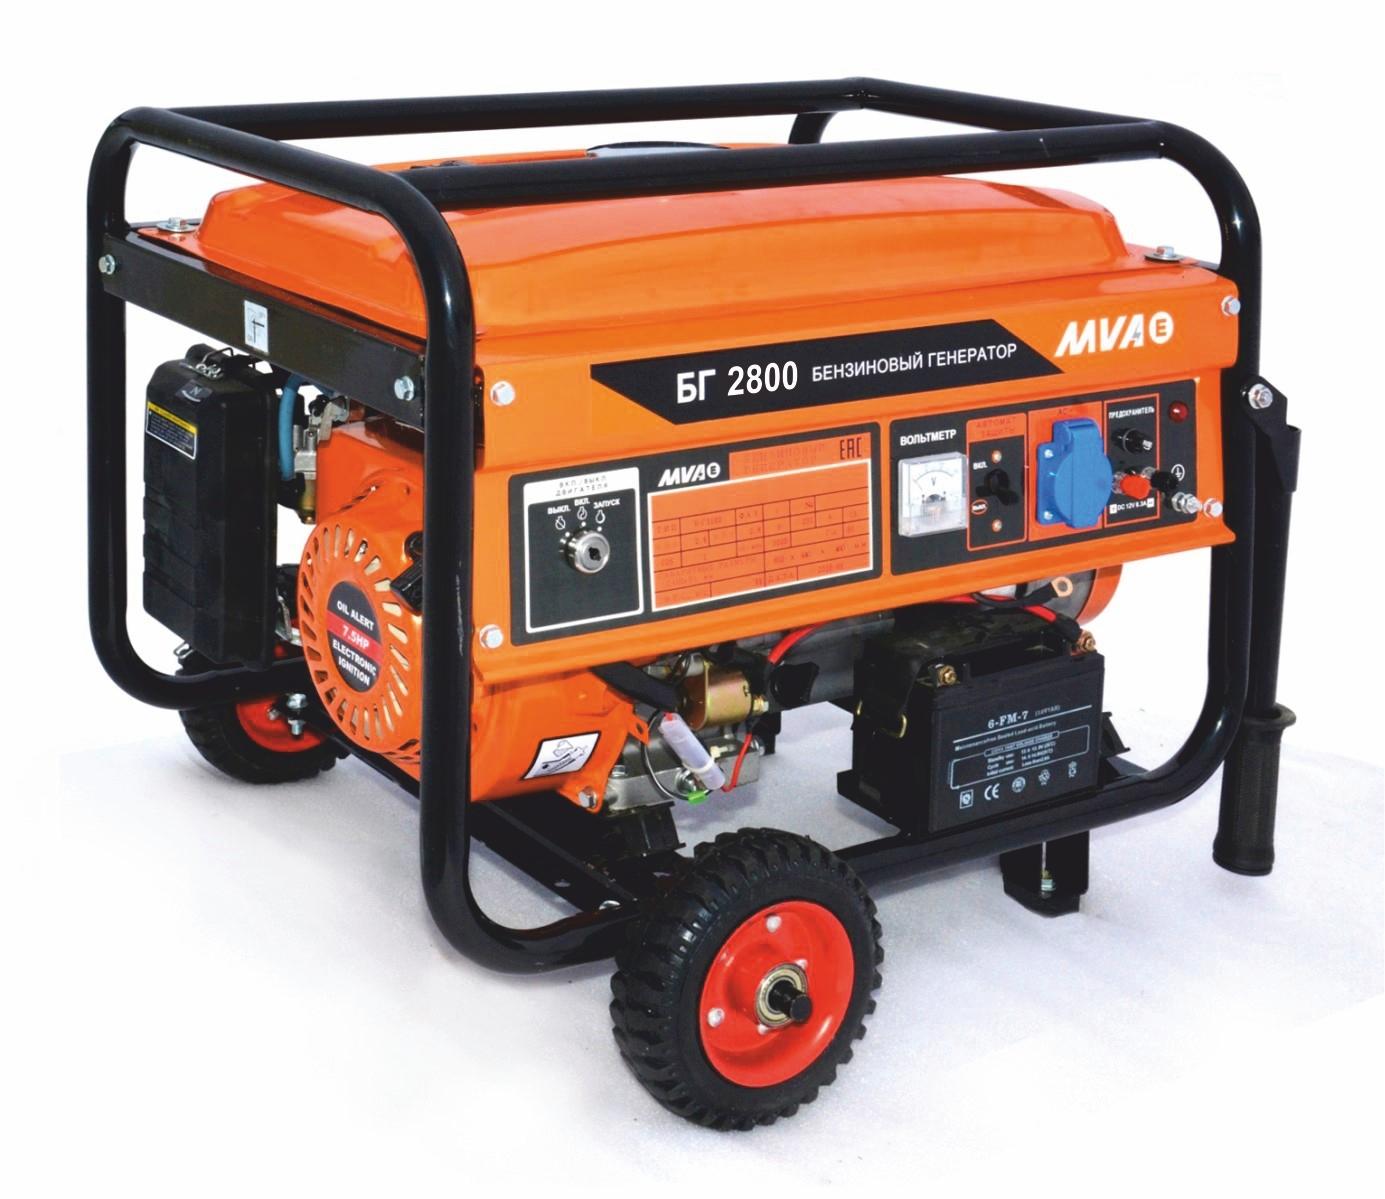 Бензиновый генератор Mvae БГ 2800